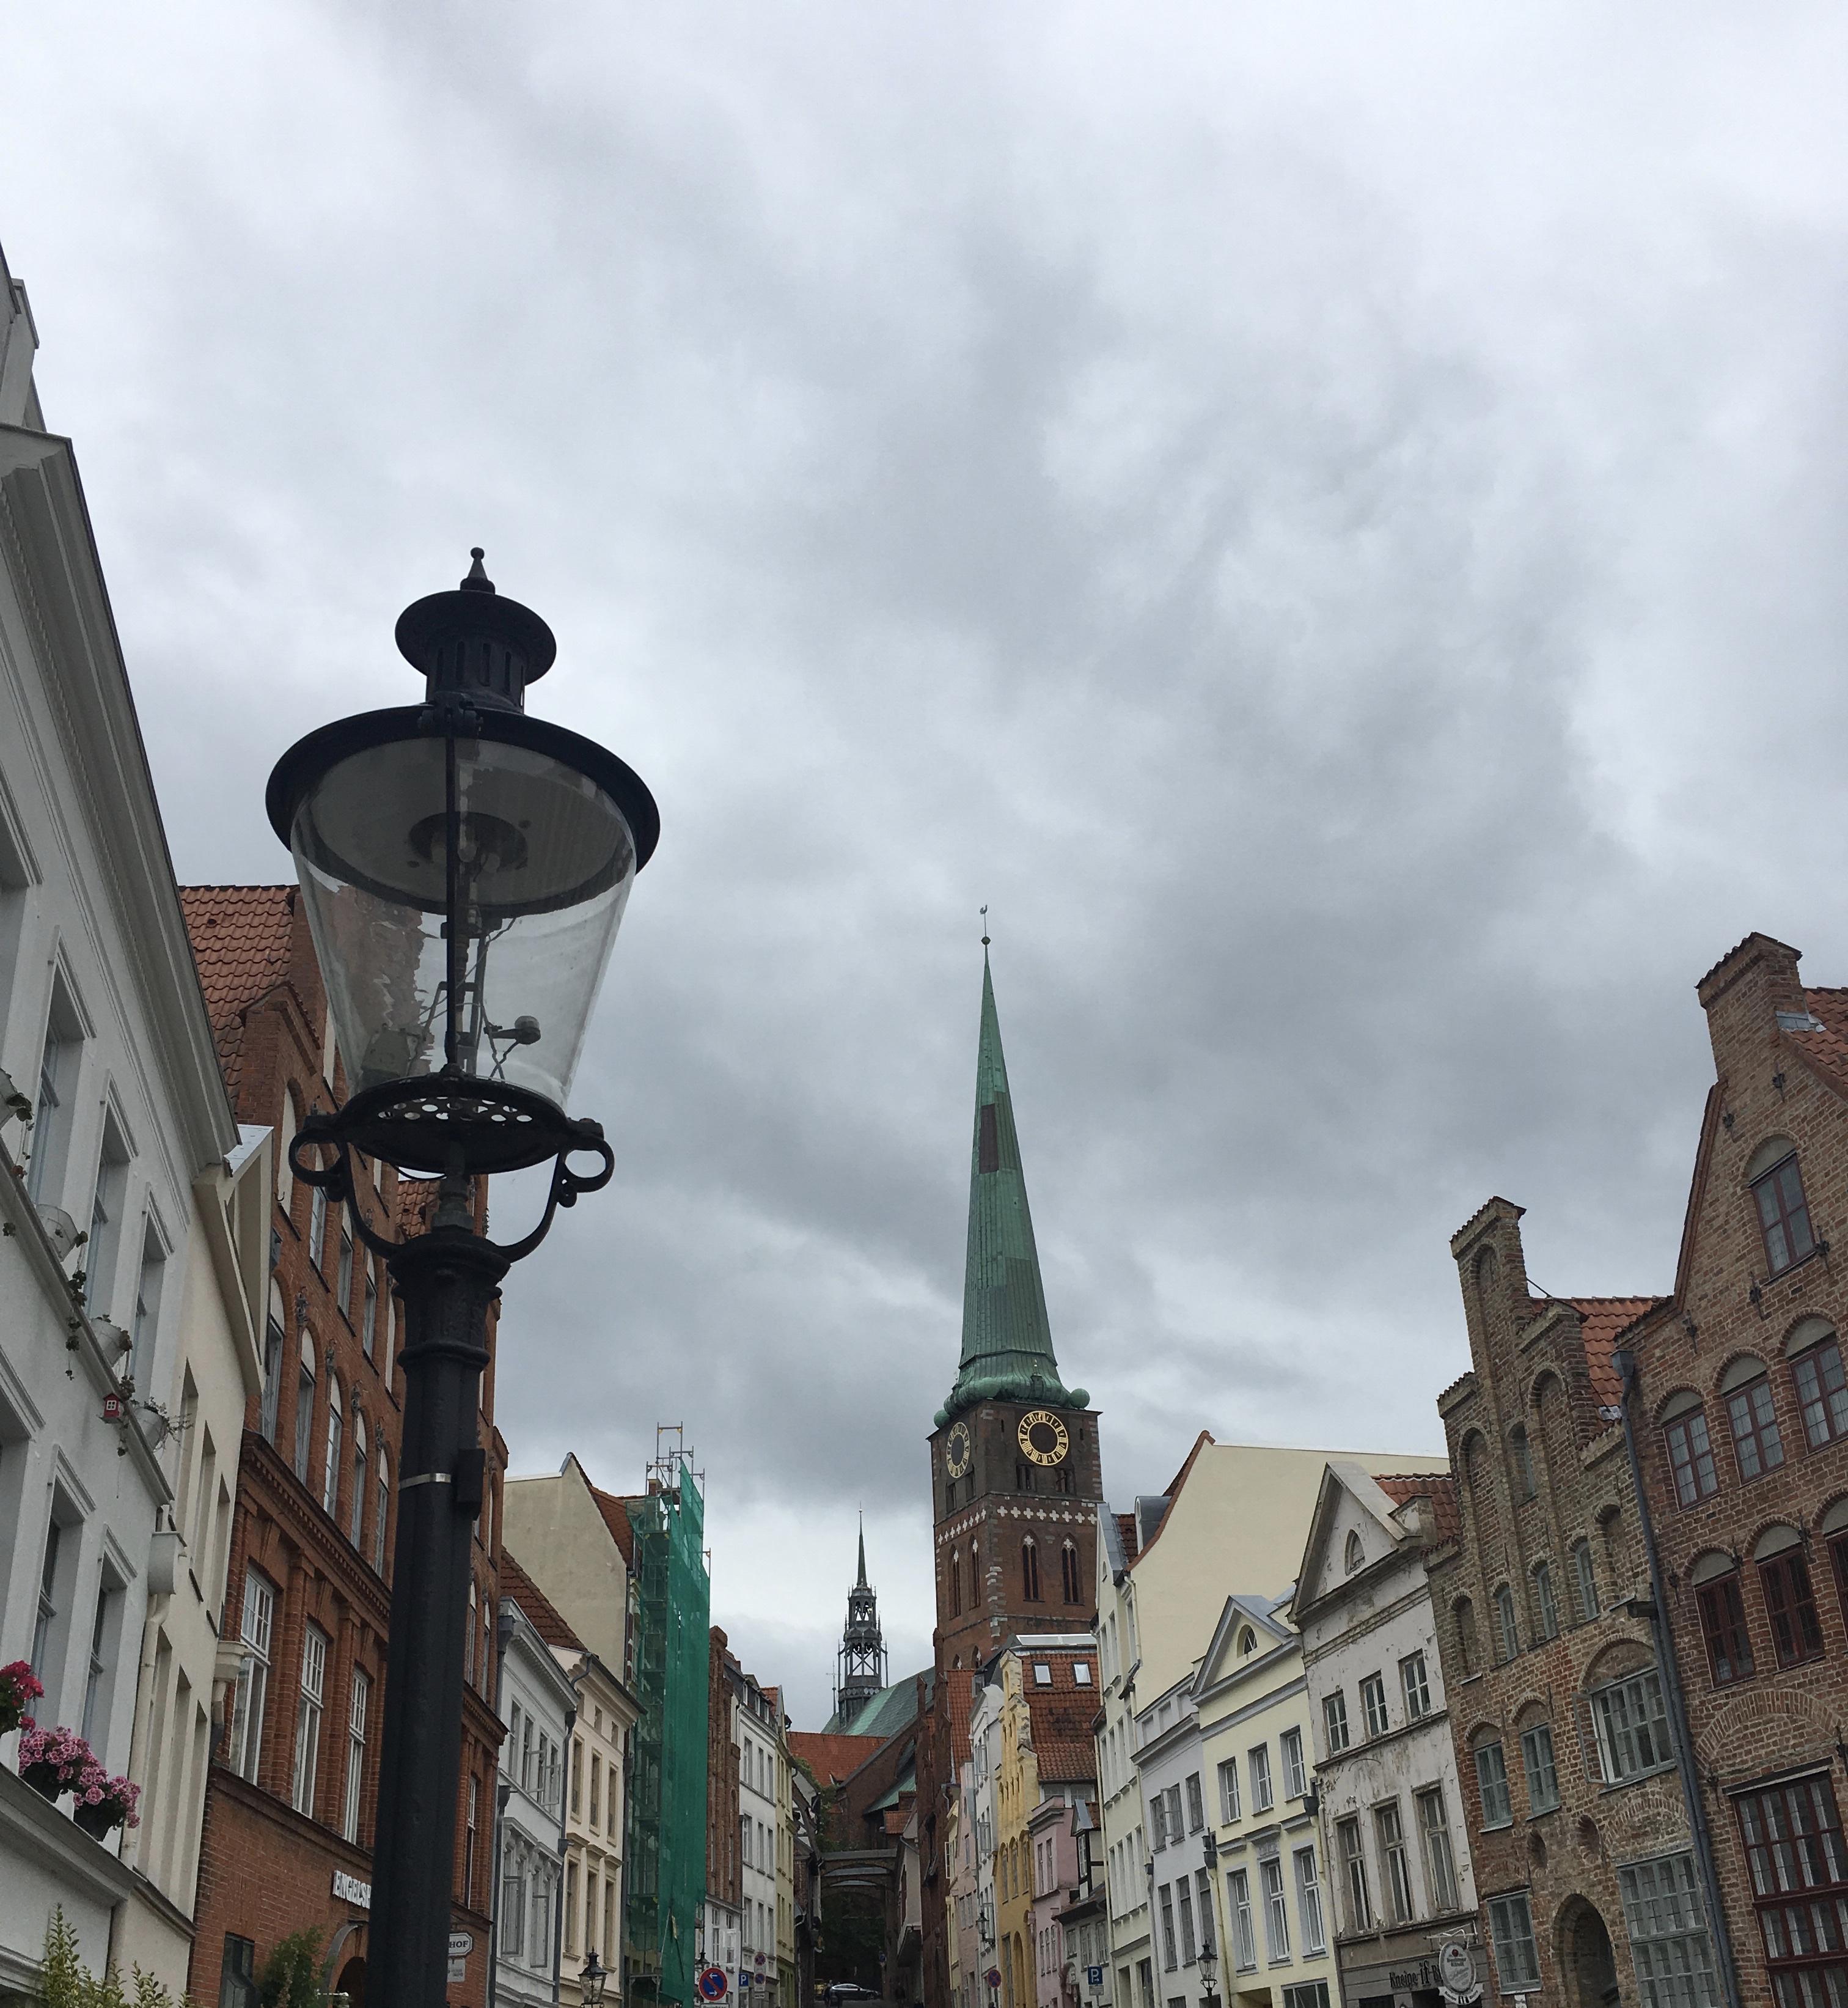 stradine-centro-storico-lubecca-schleswig-holstein-germania